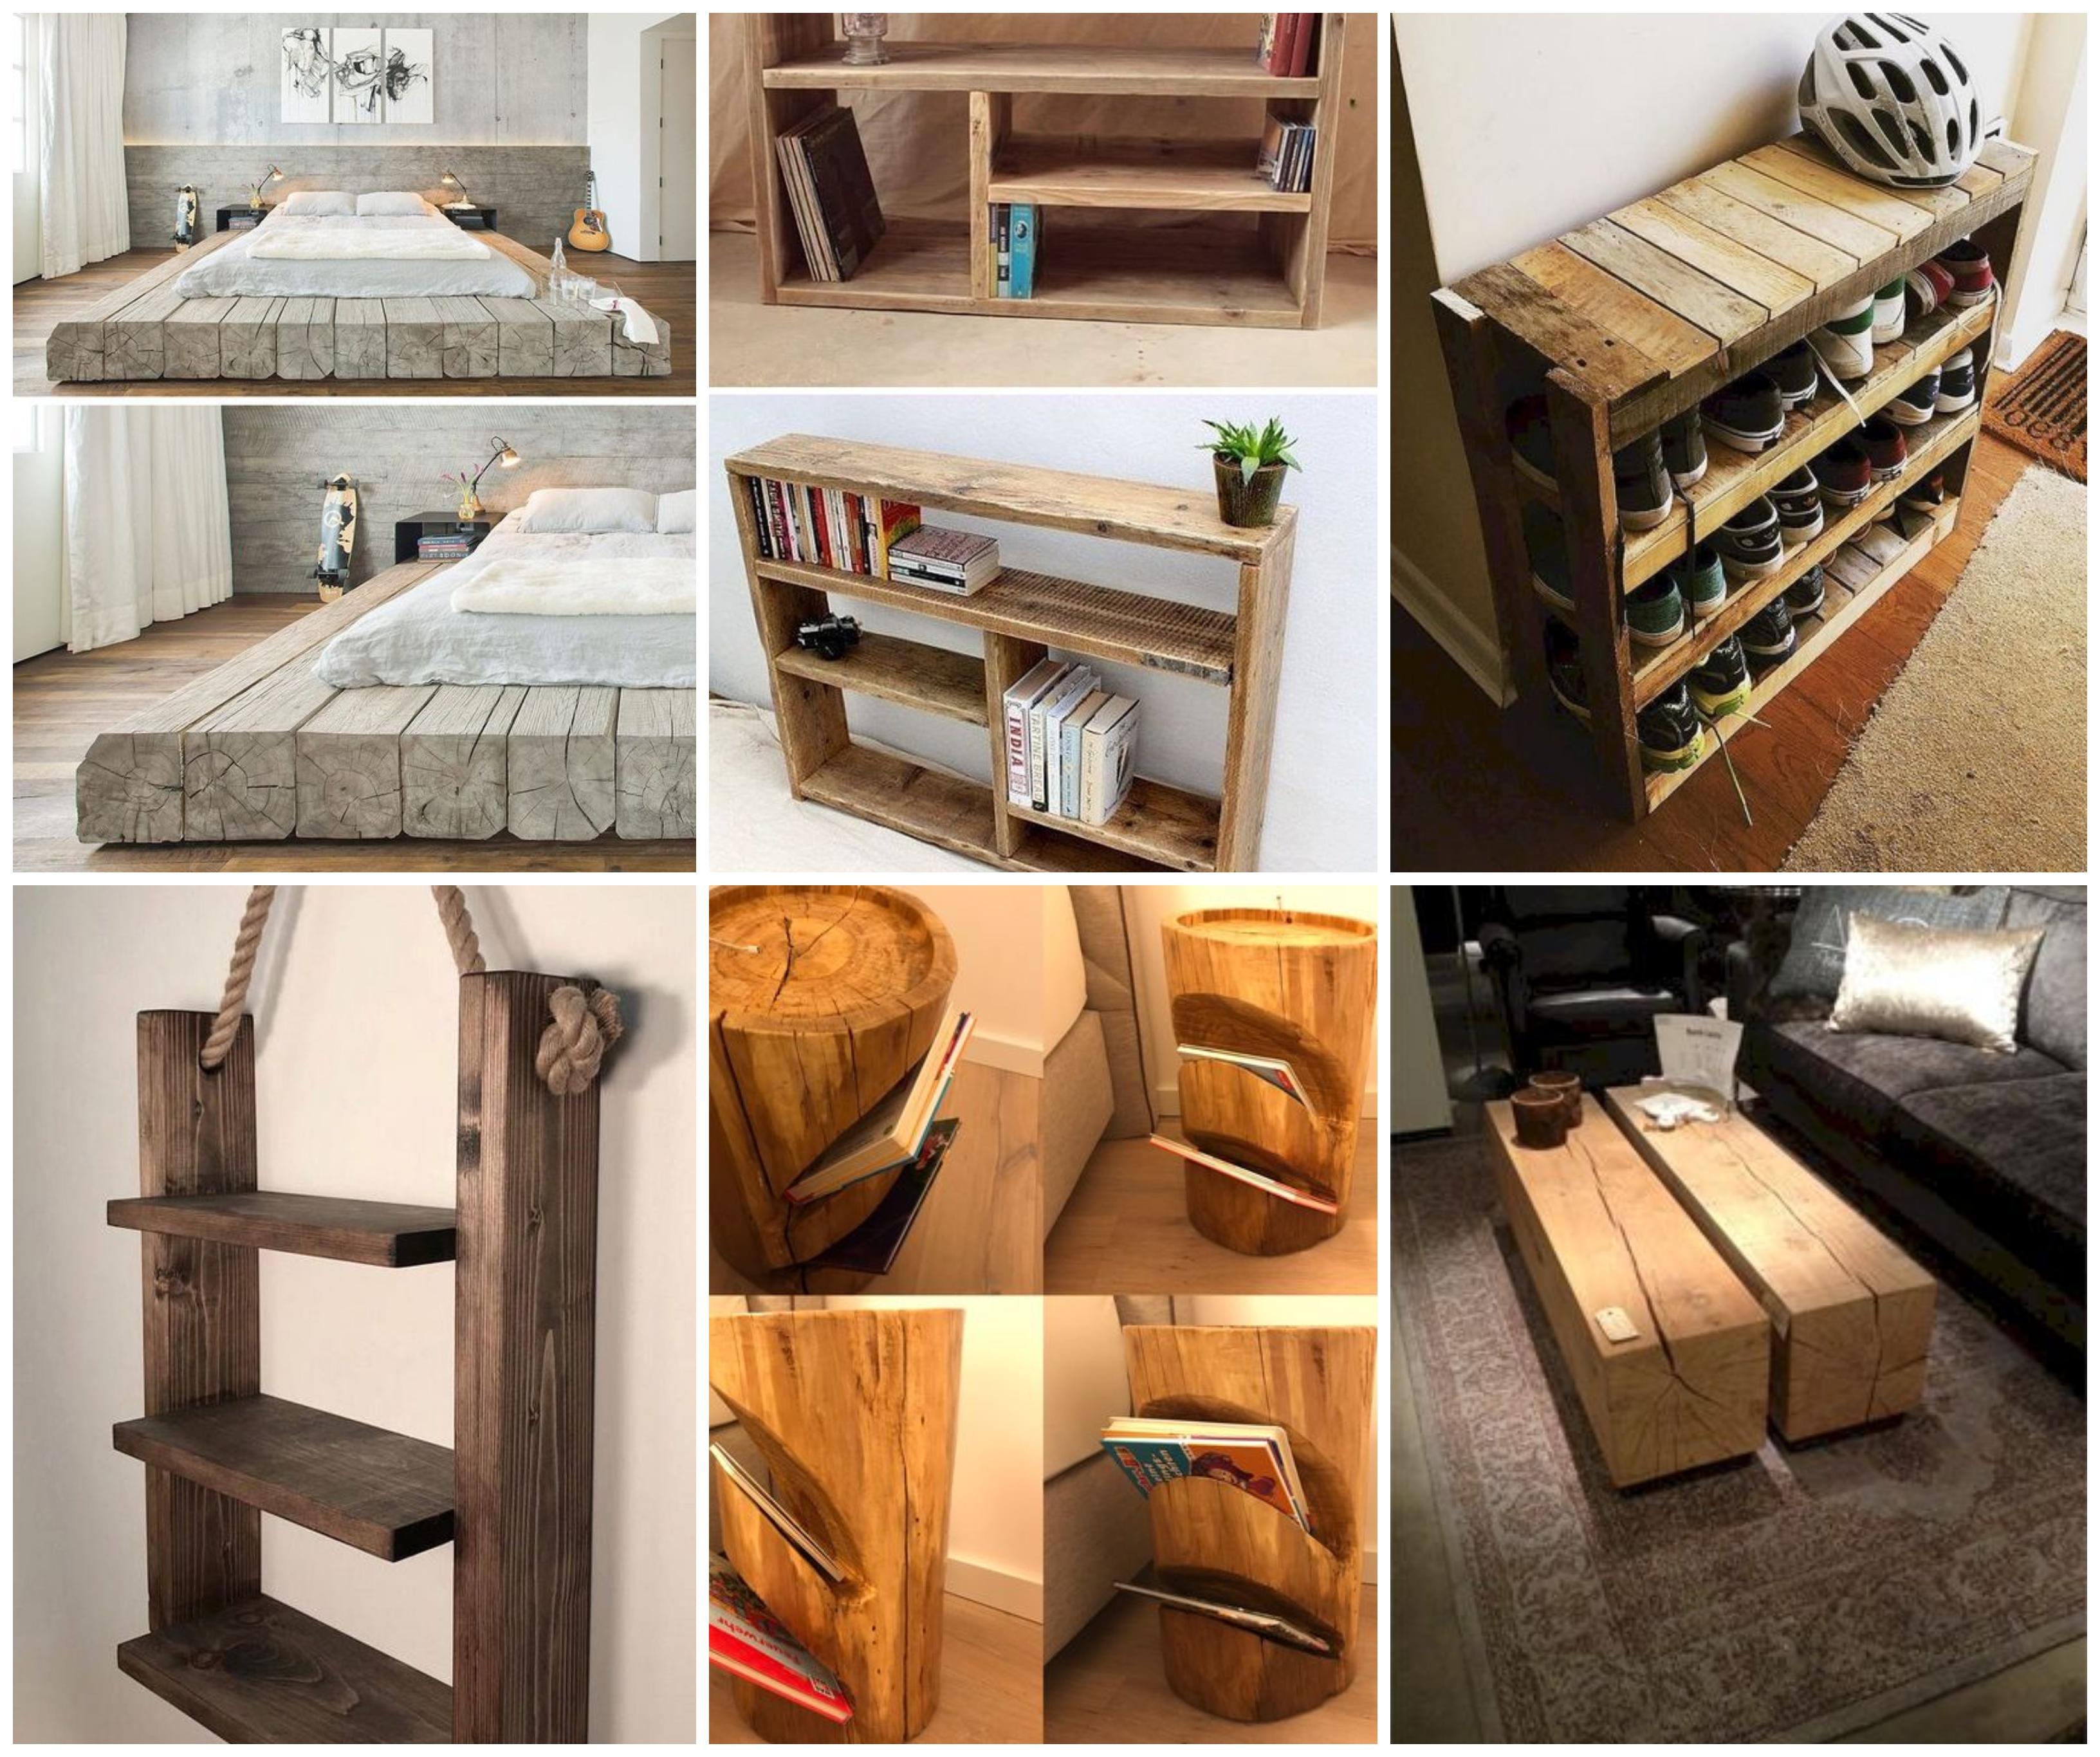 10+ Diy Holz-Möbel selber bauen :) - nettetipps.de